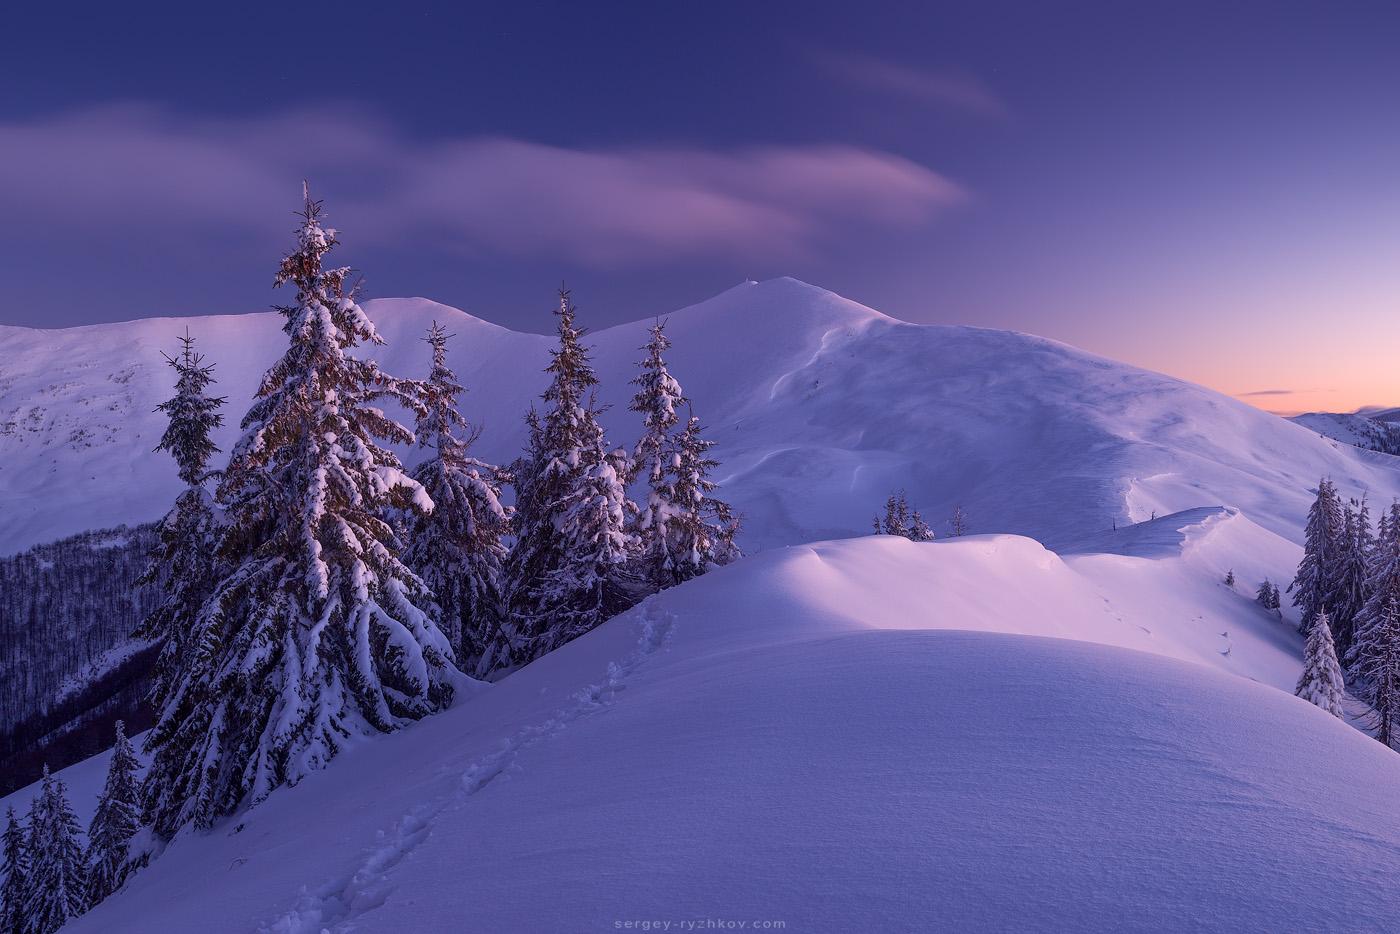 Зима в Карпатах, хребет Пішконя